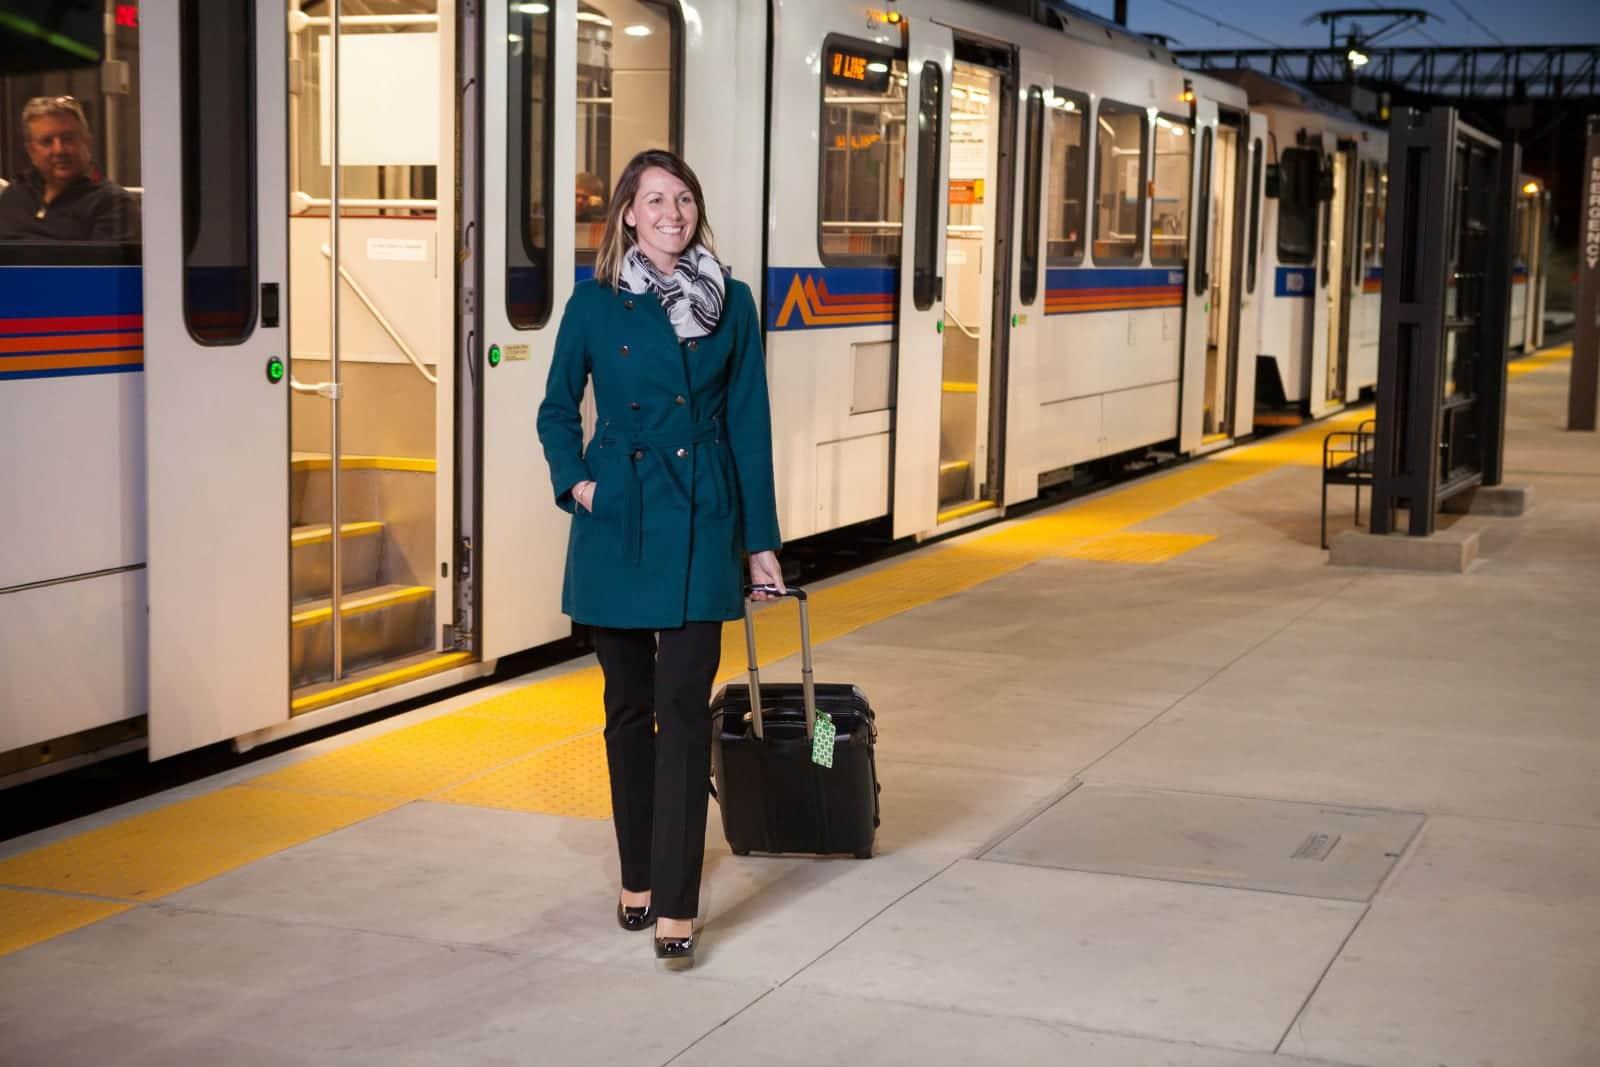 RTD Train Business Woman Exiting Light Rail